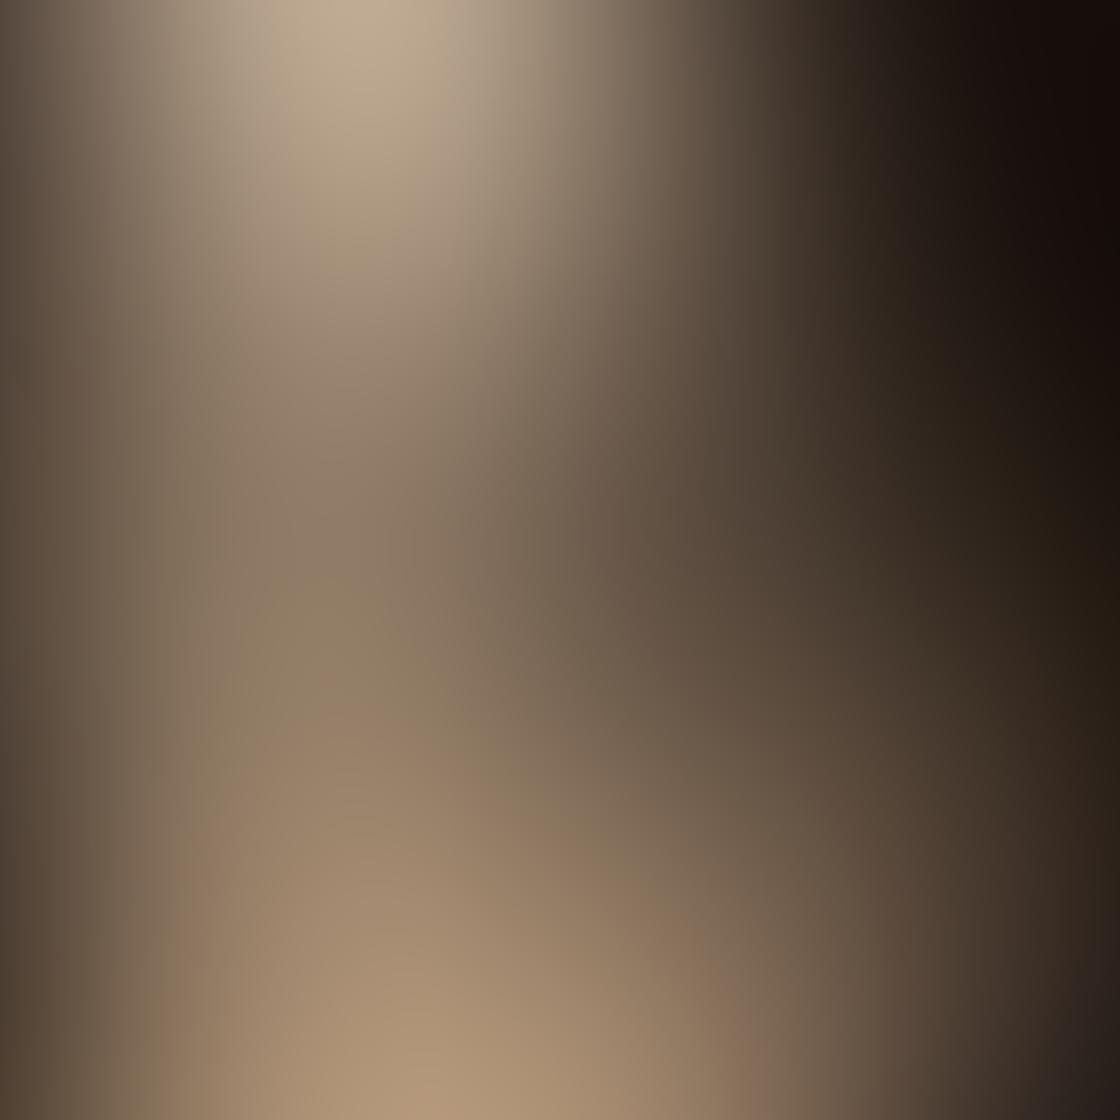 iPhone Angle Photo 17